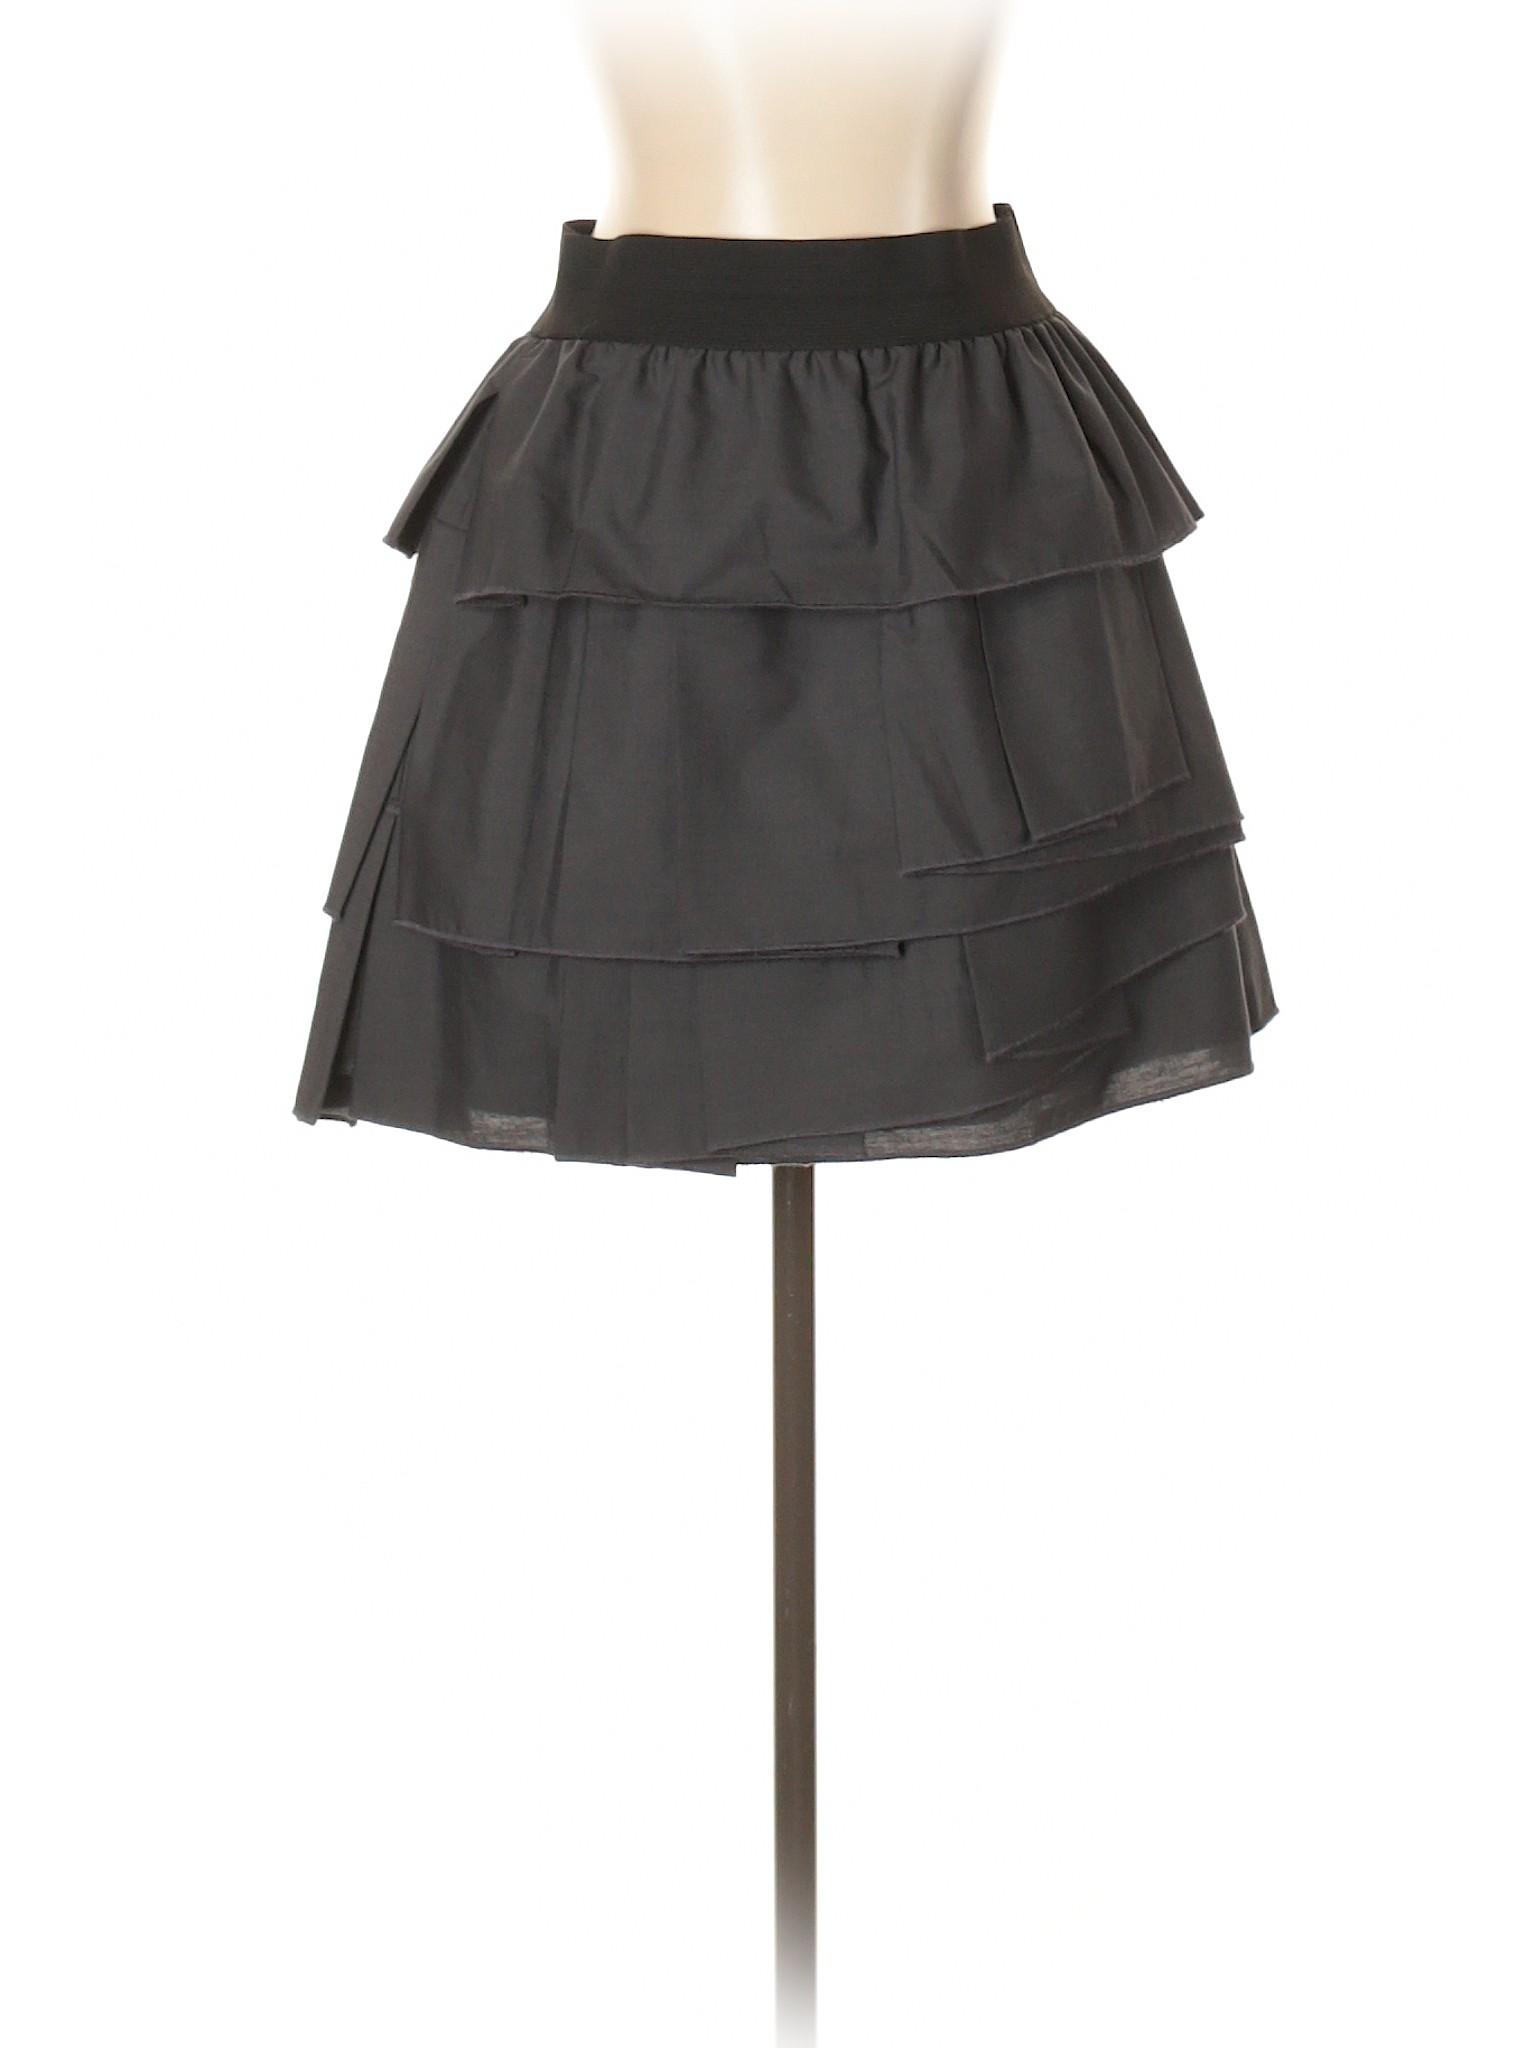 leisure Boutique Aqua Casual Boutique Boutique Skirt Casual leisure Skirt Aqua BgqCYwff